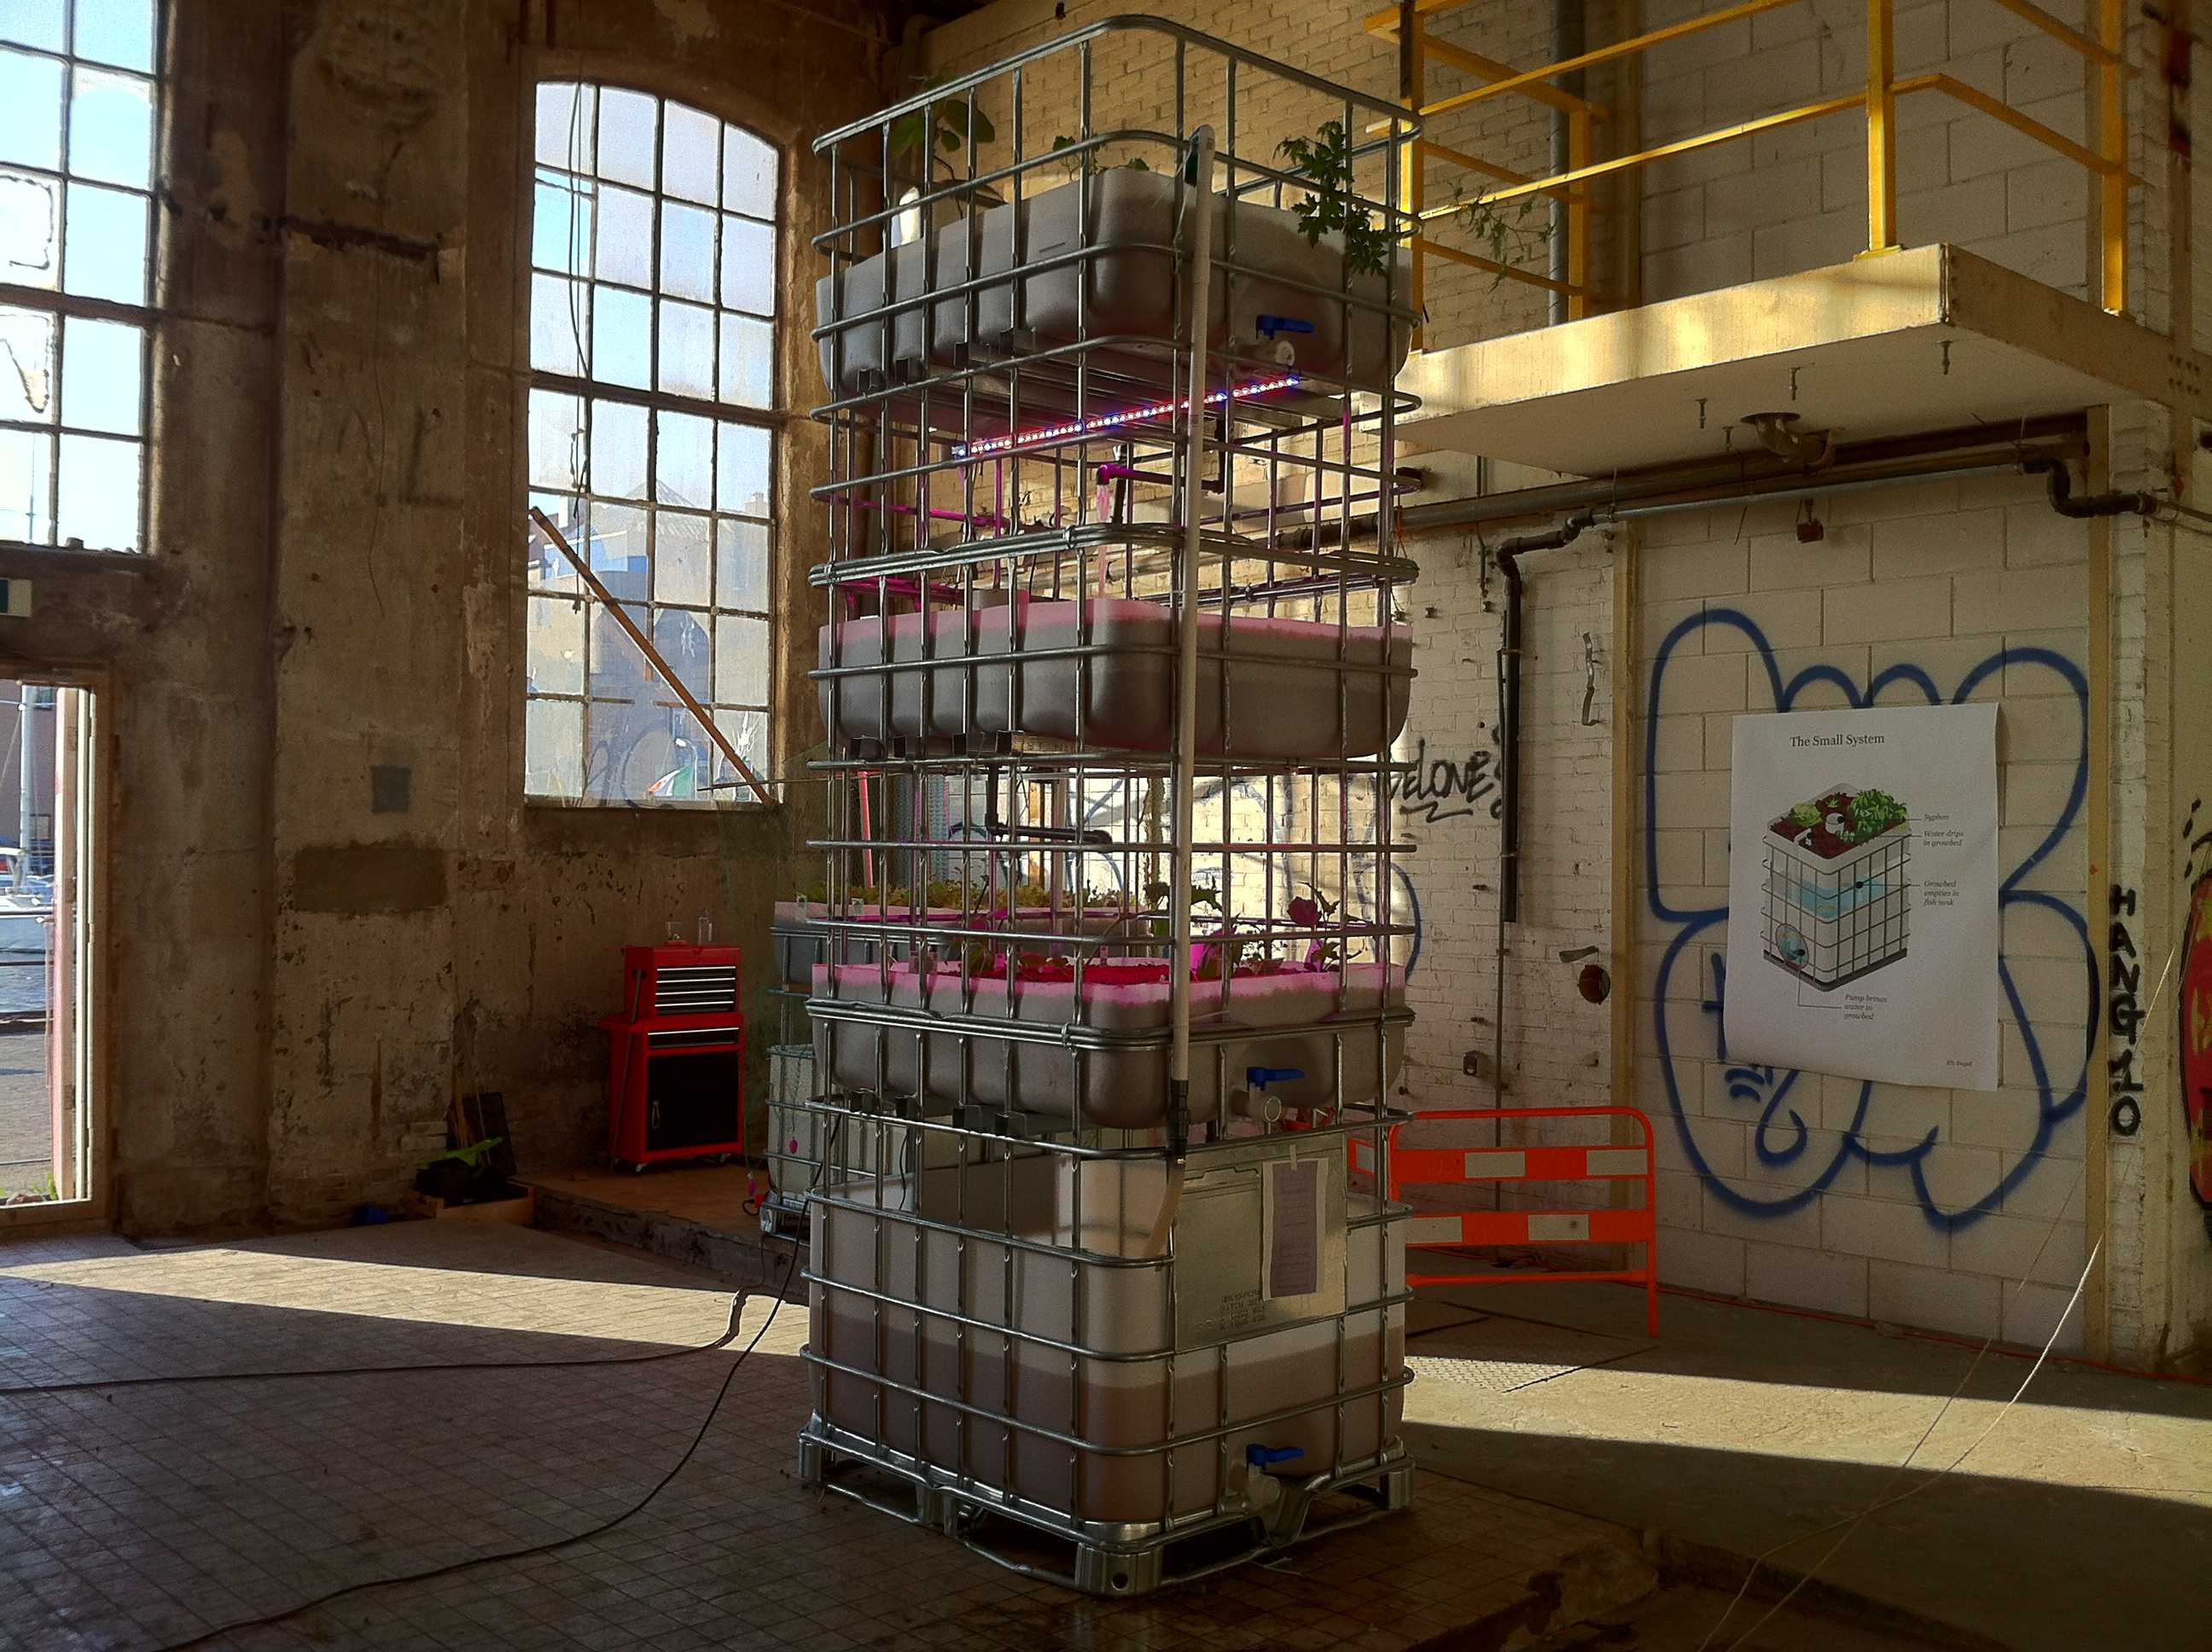 Aquaponics at Mediamatic Fabriek - Mediamatic on small vegetable greenhouse, small solar greenhouse, micro aquaponics greenhouse, easy aquaponics greenhouse, private aquaponics greenhouse,